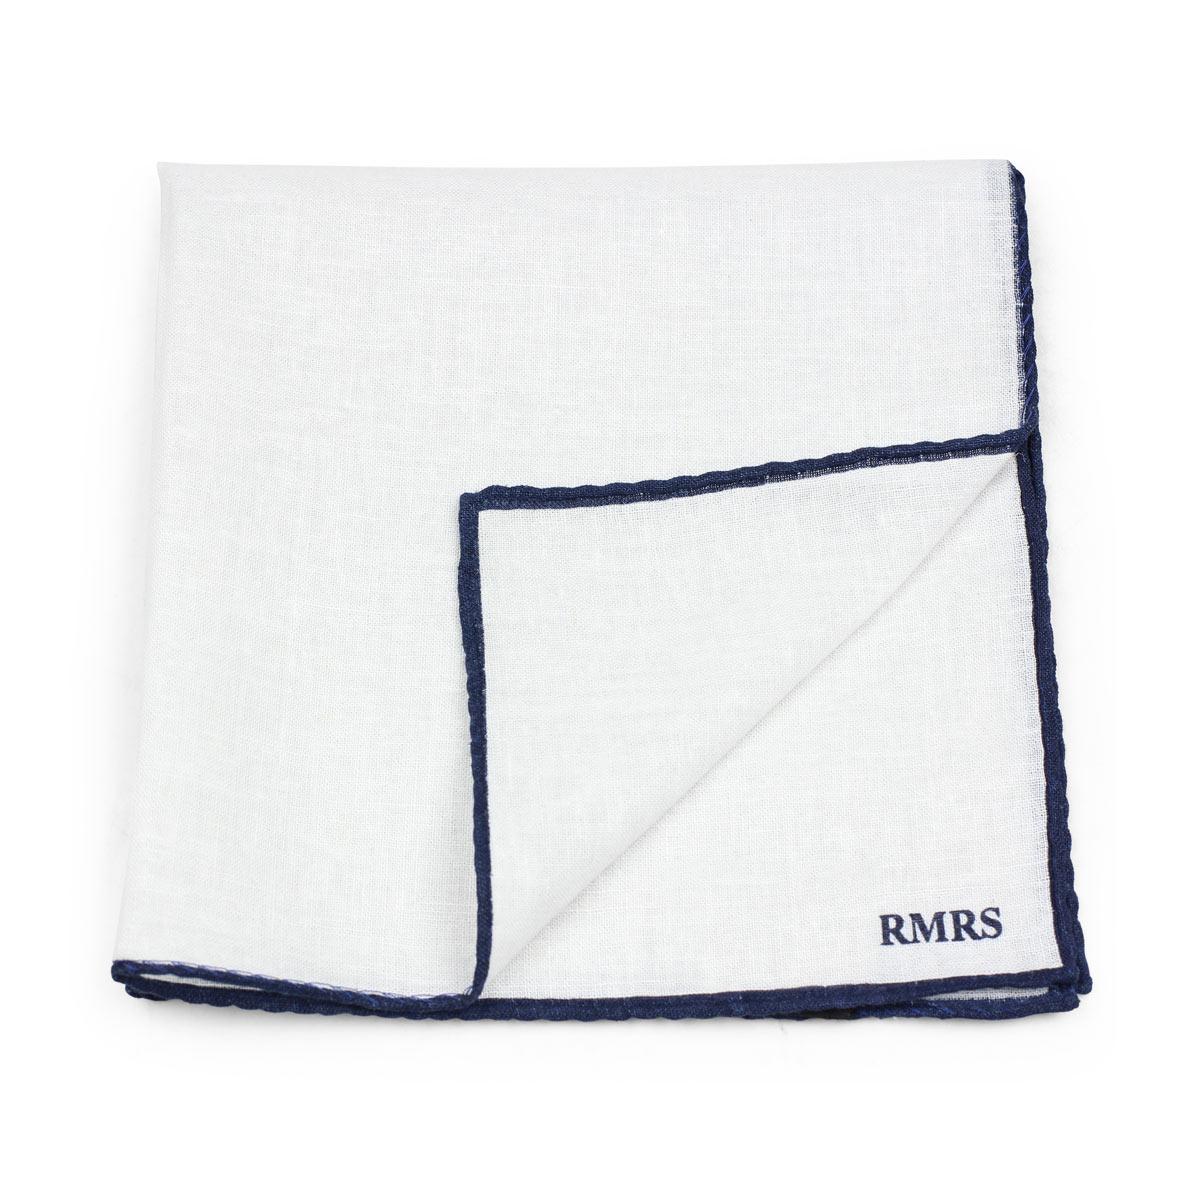 RMRS Linen Pocket Square